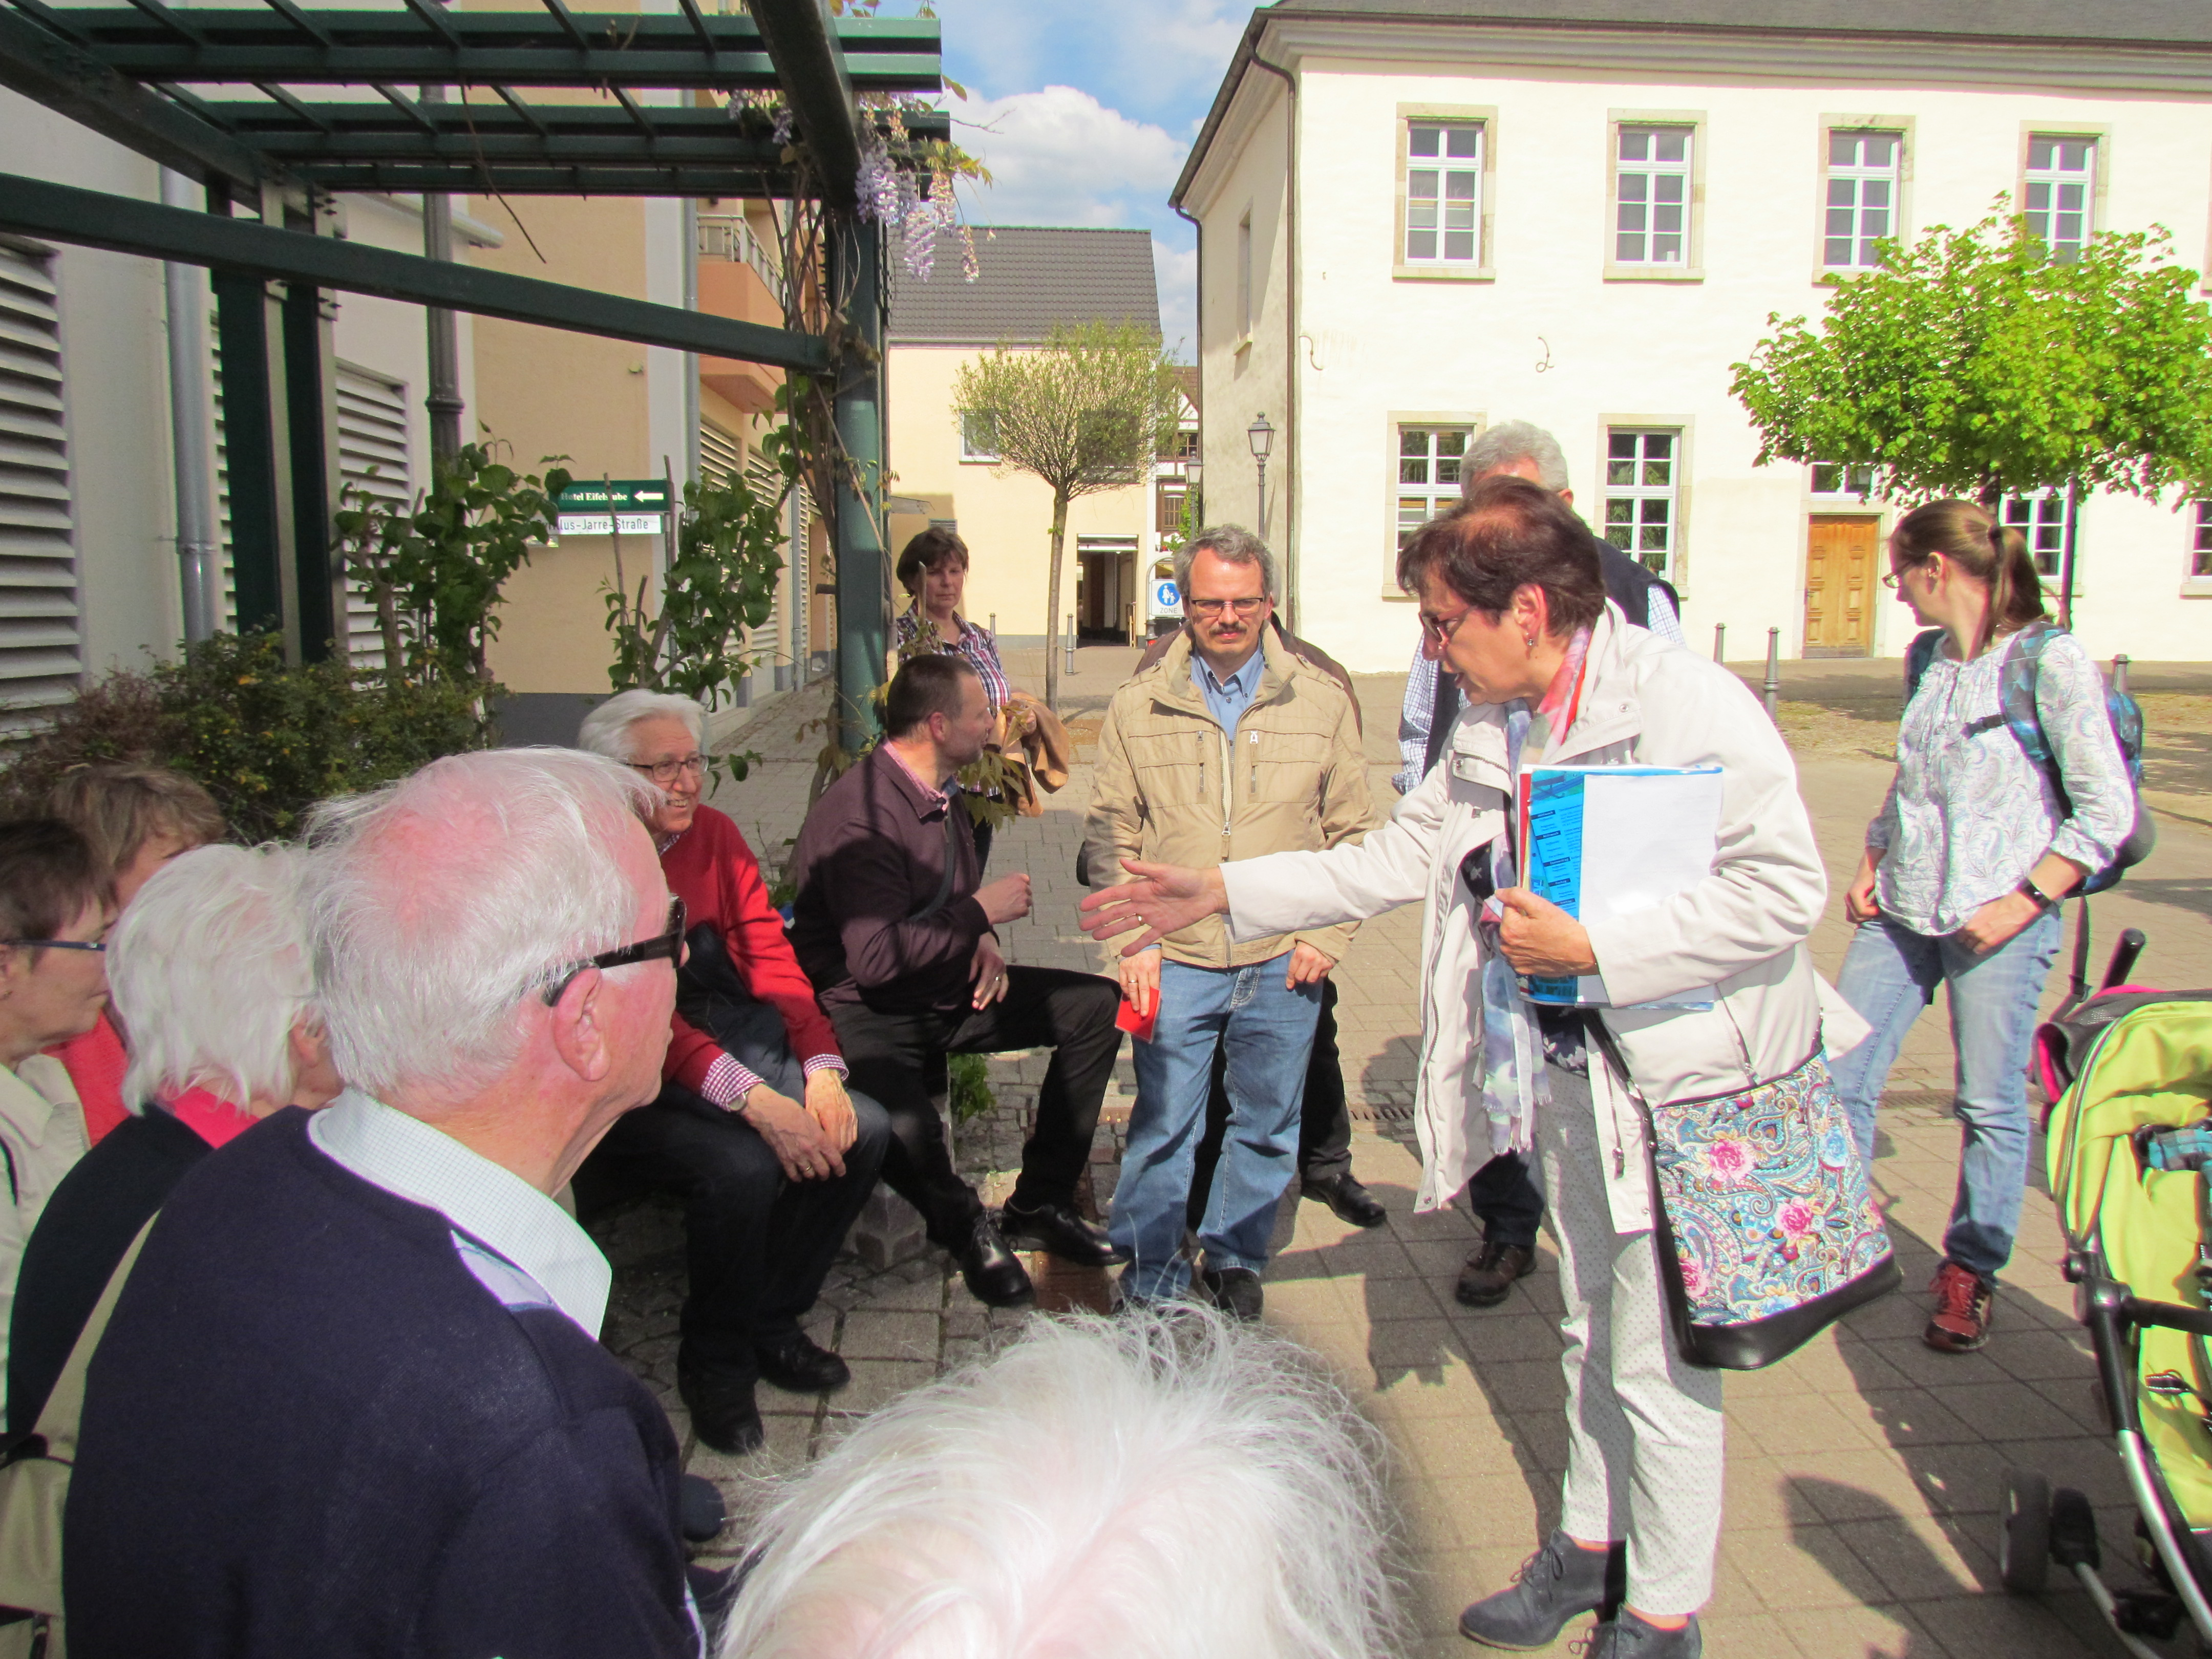 2017-05-Mai-06-Chorausflug-Ahrweiler_Bernd-Finken_042